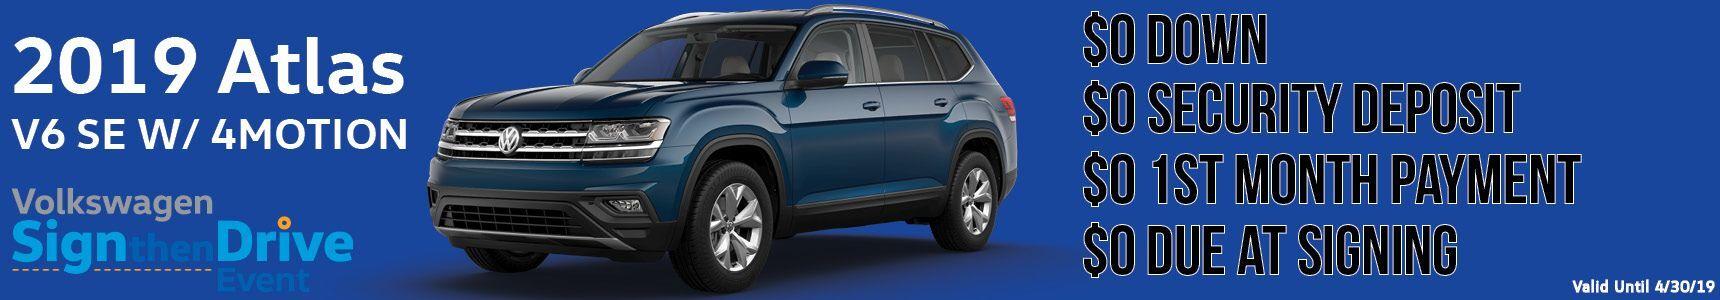 2019 Volkswagen Atlas dealership lease banner